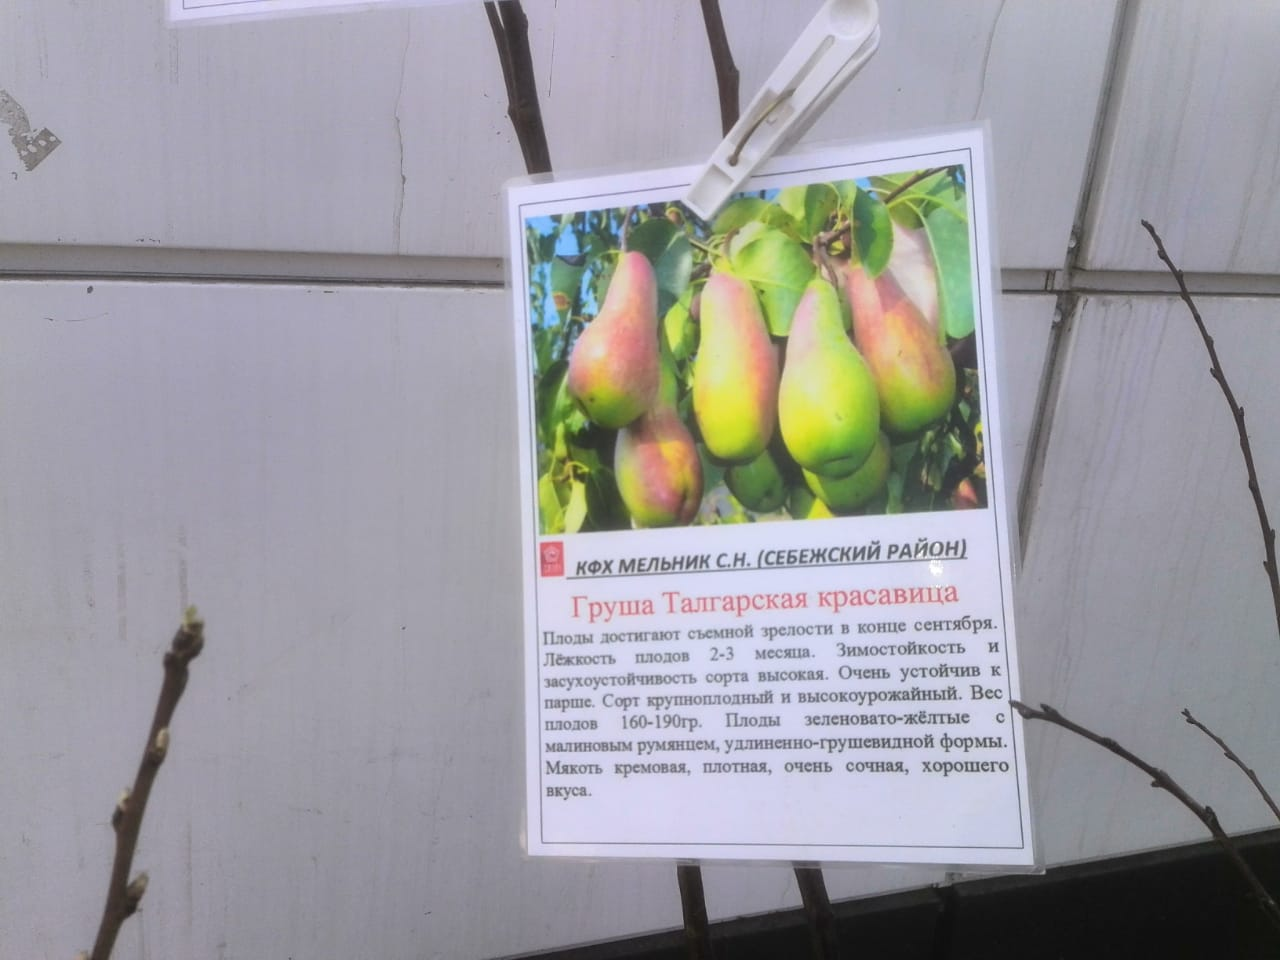 Груша талгарская красавица – фото и описание